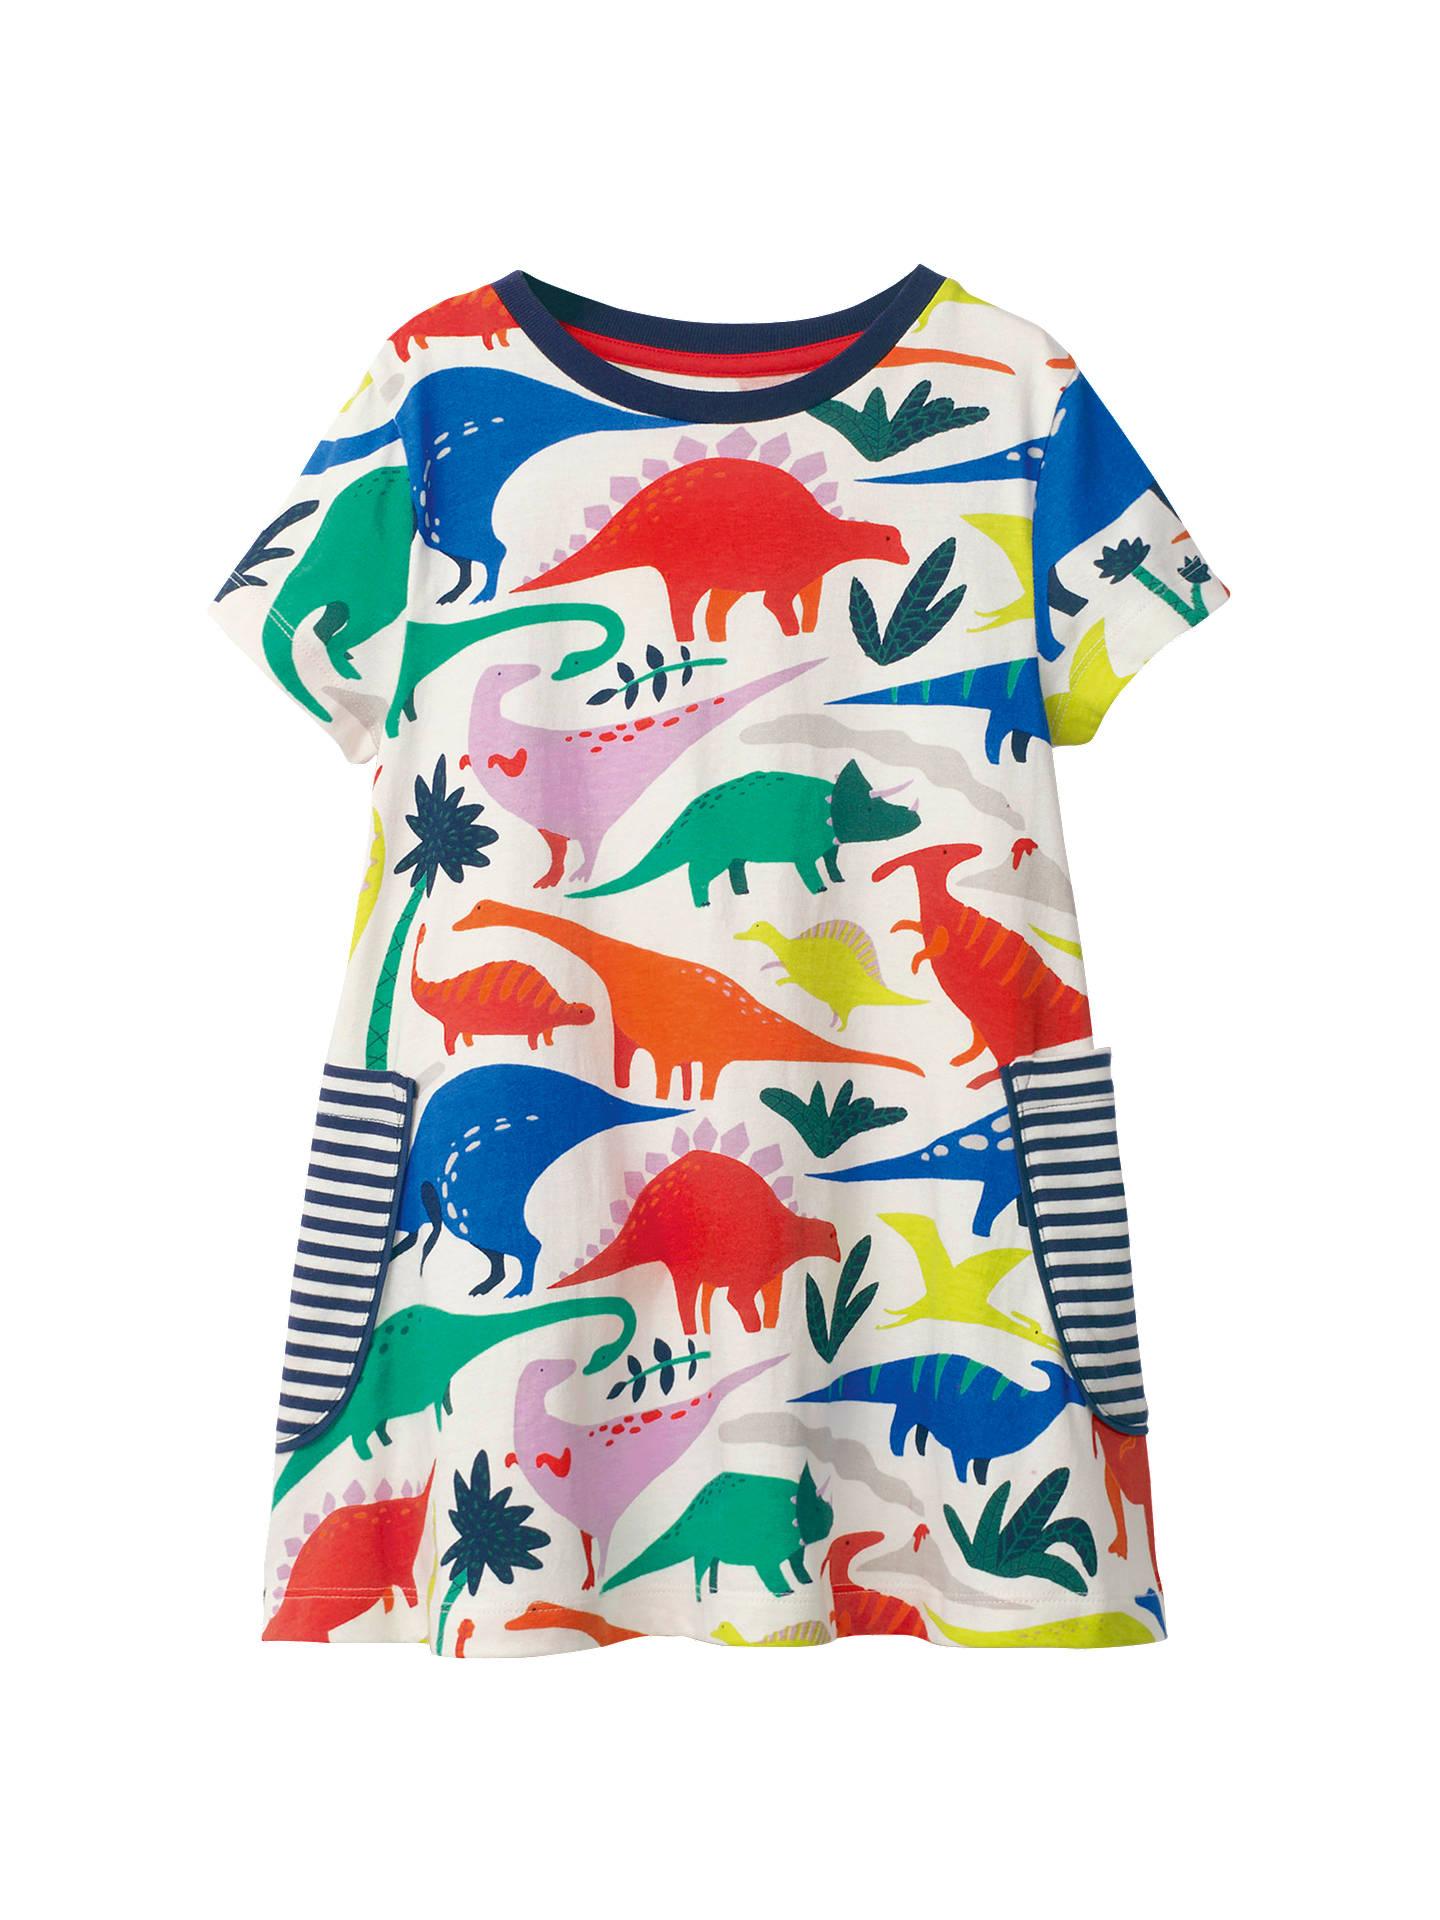 243139798e2b4 Mini Boden Girls' Colourful Dinosaur Print Tunic Dress, Multi at ...